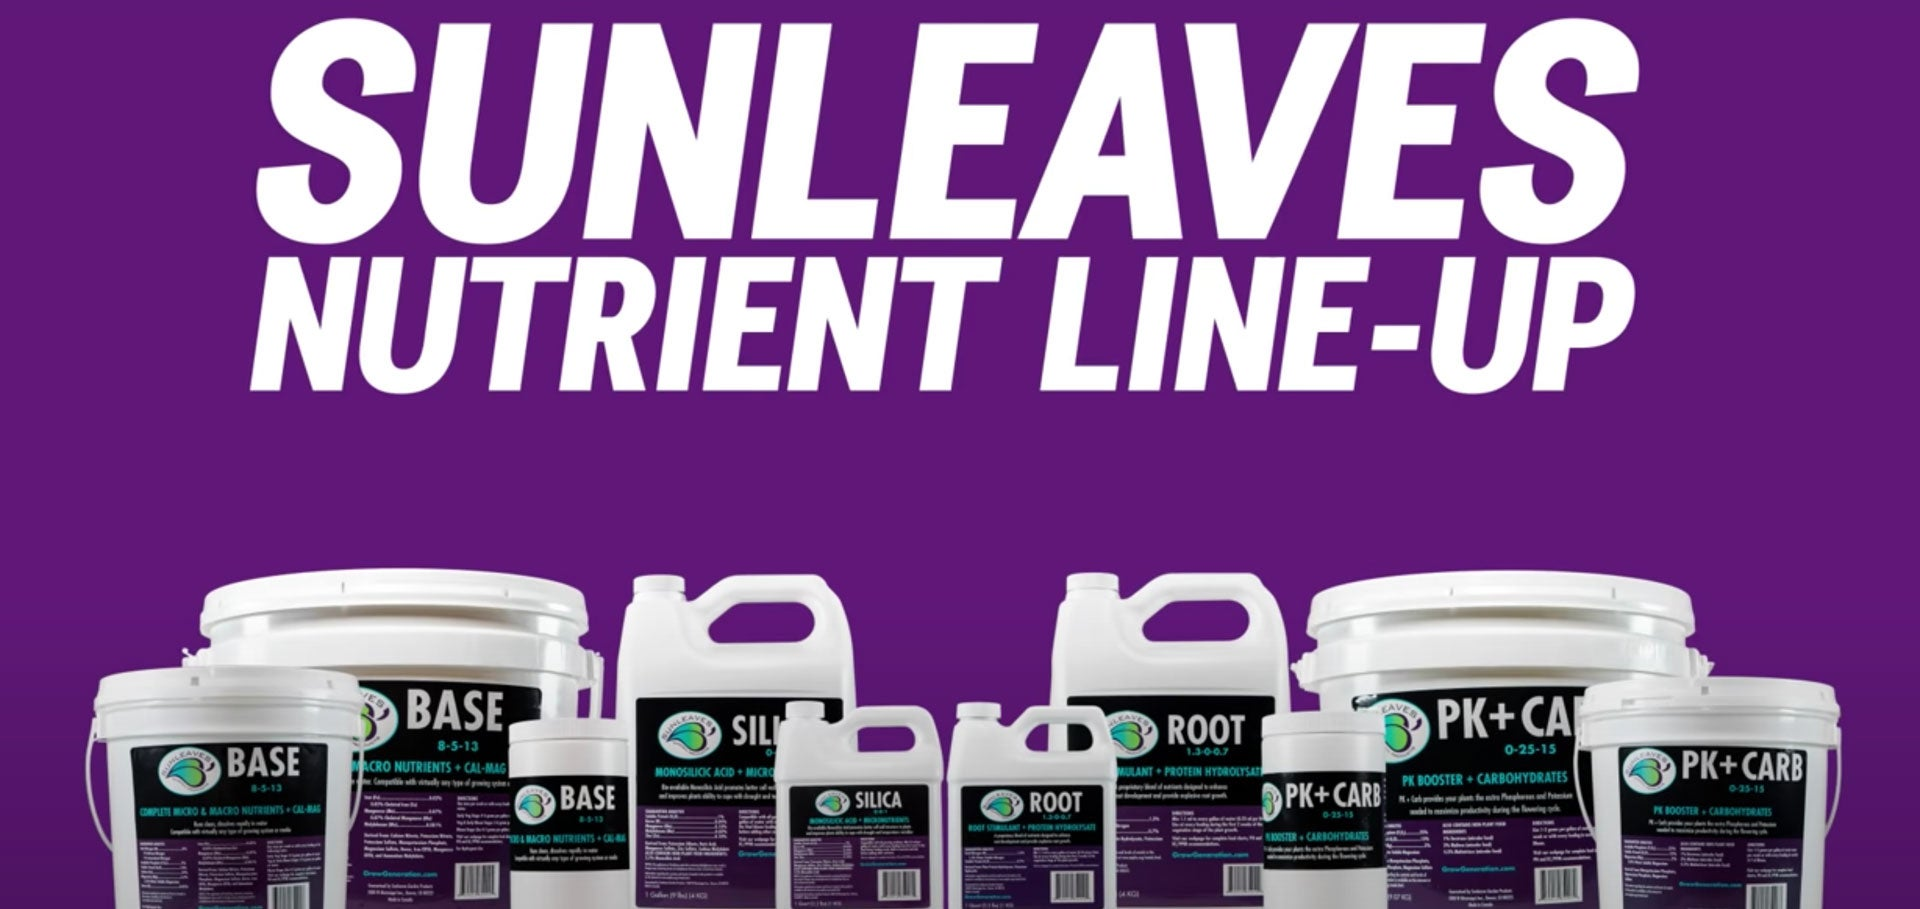 SunLeaves Nutrient Line-Up